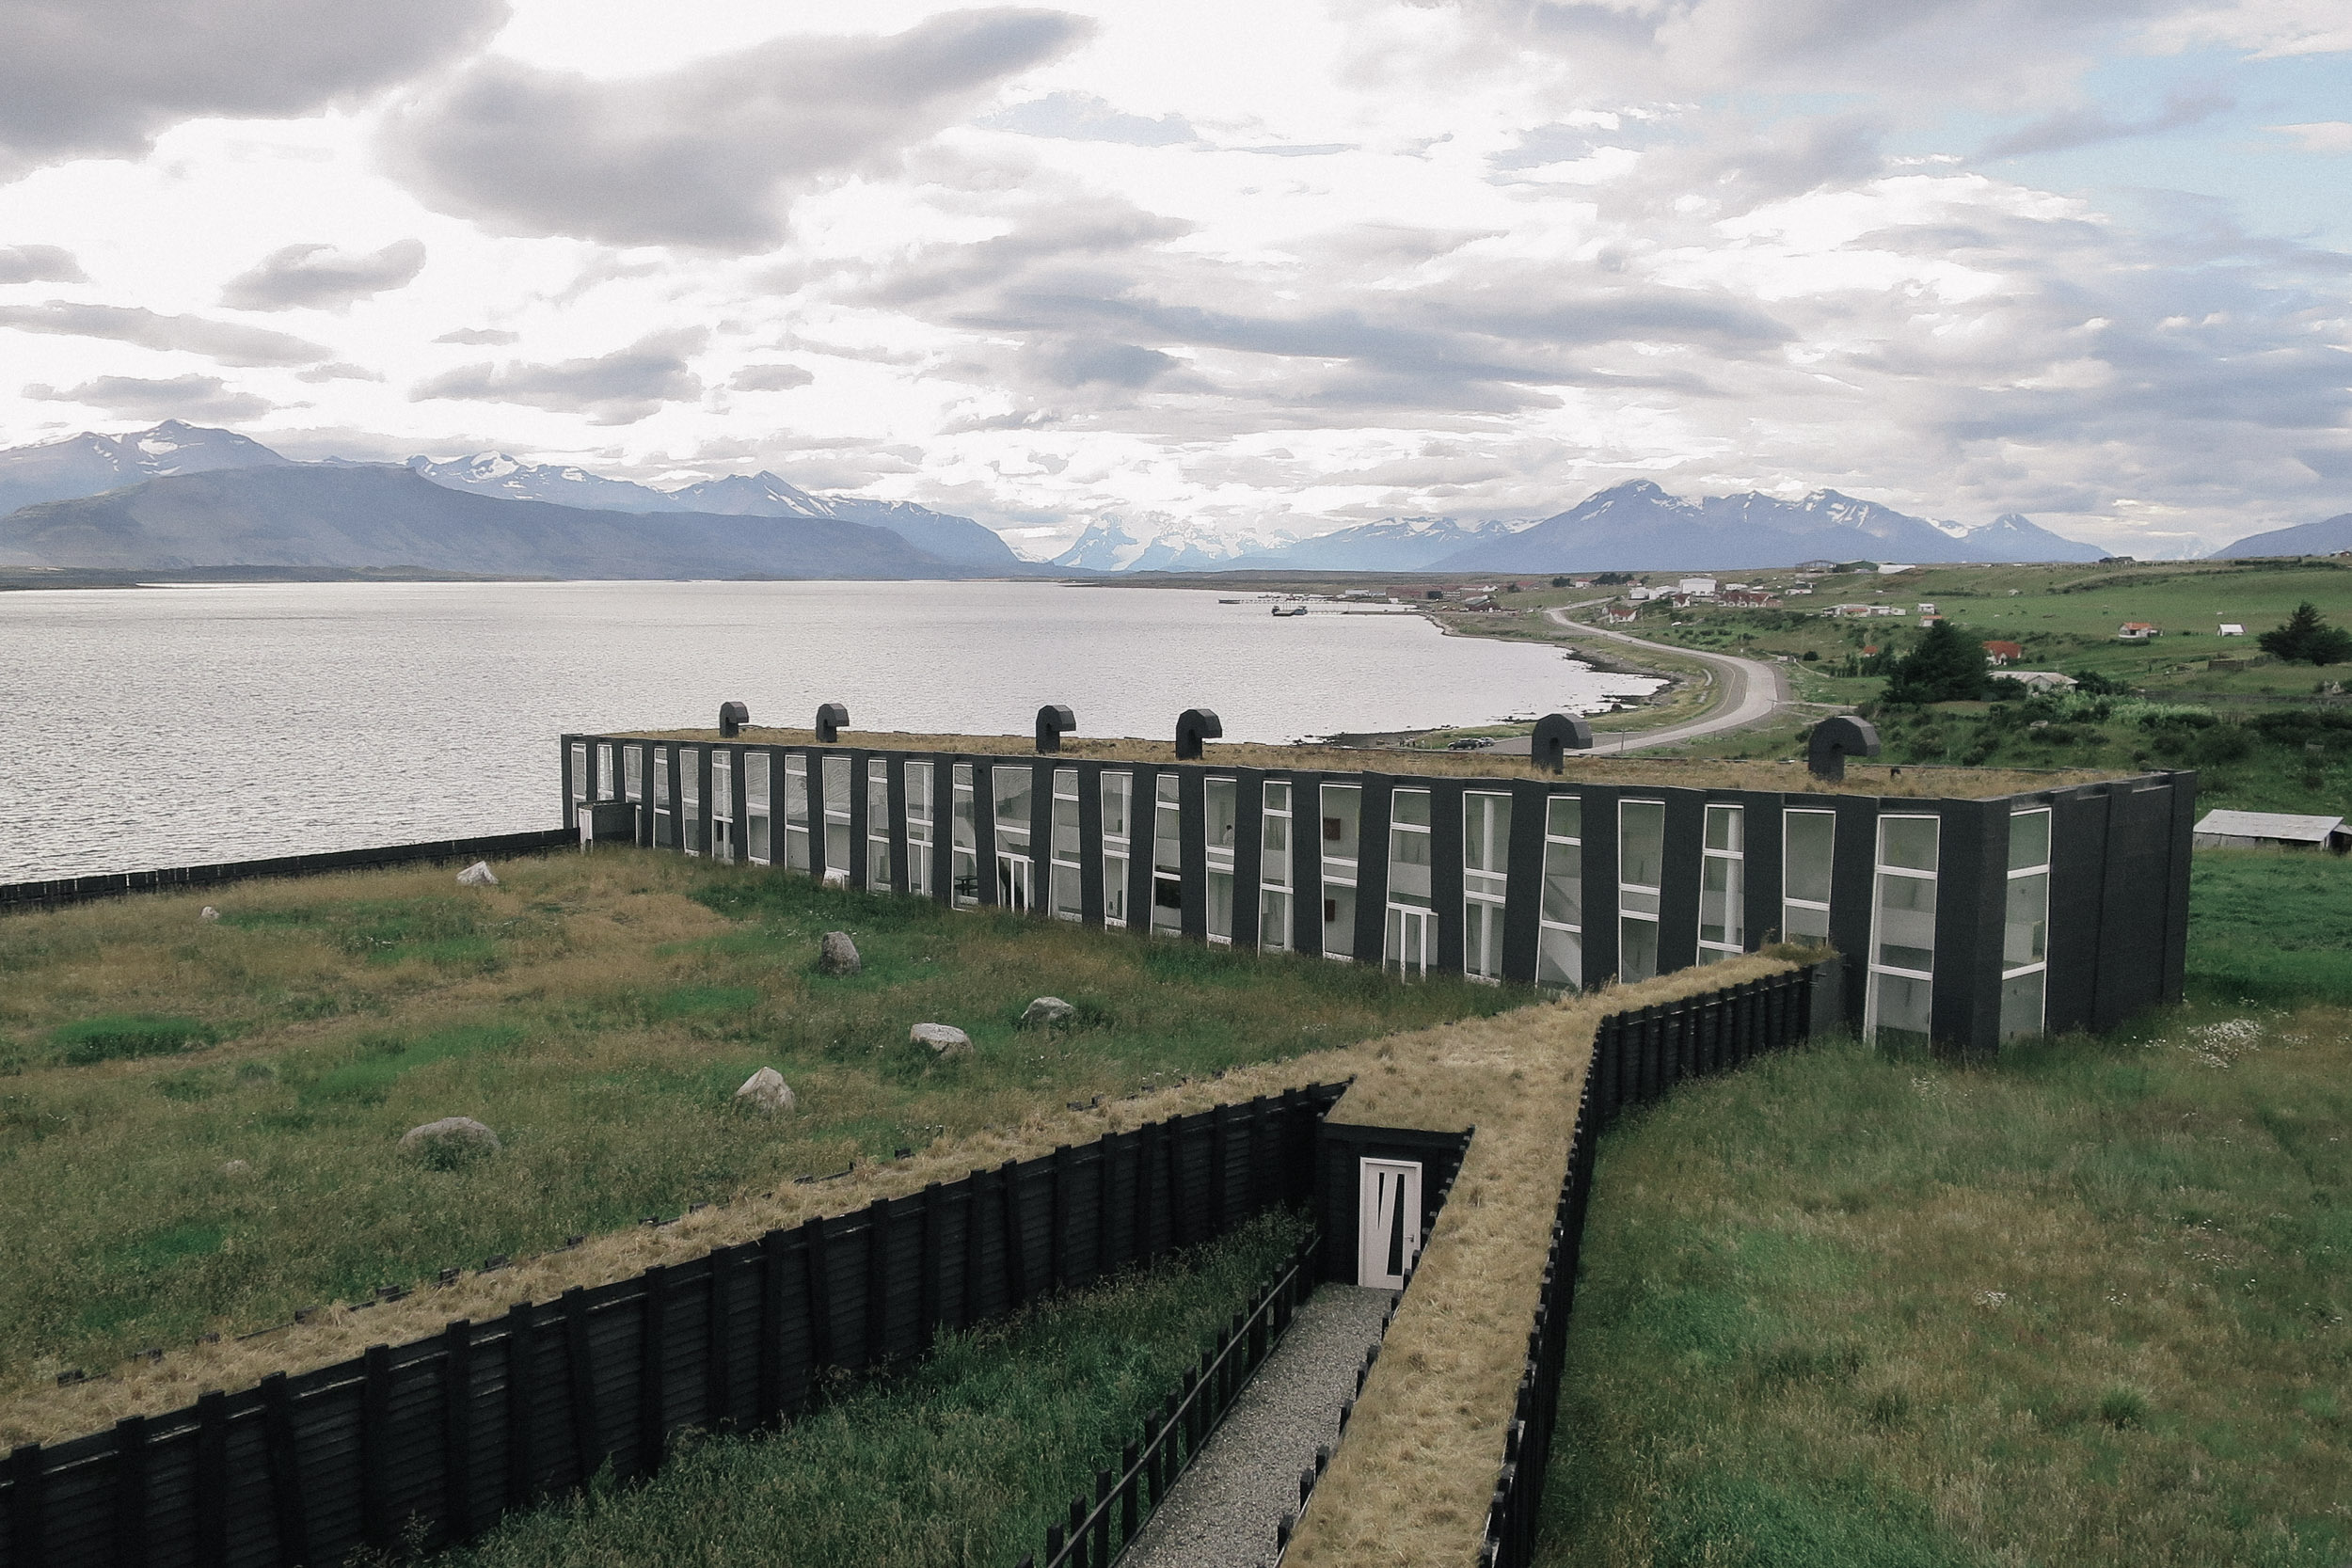 REMOTA PATAGONIA LODGE - Puerto Natales, Chile